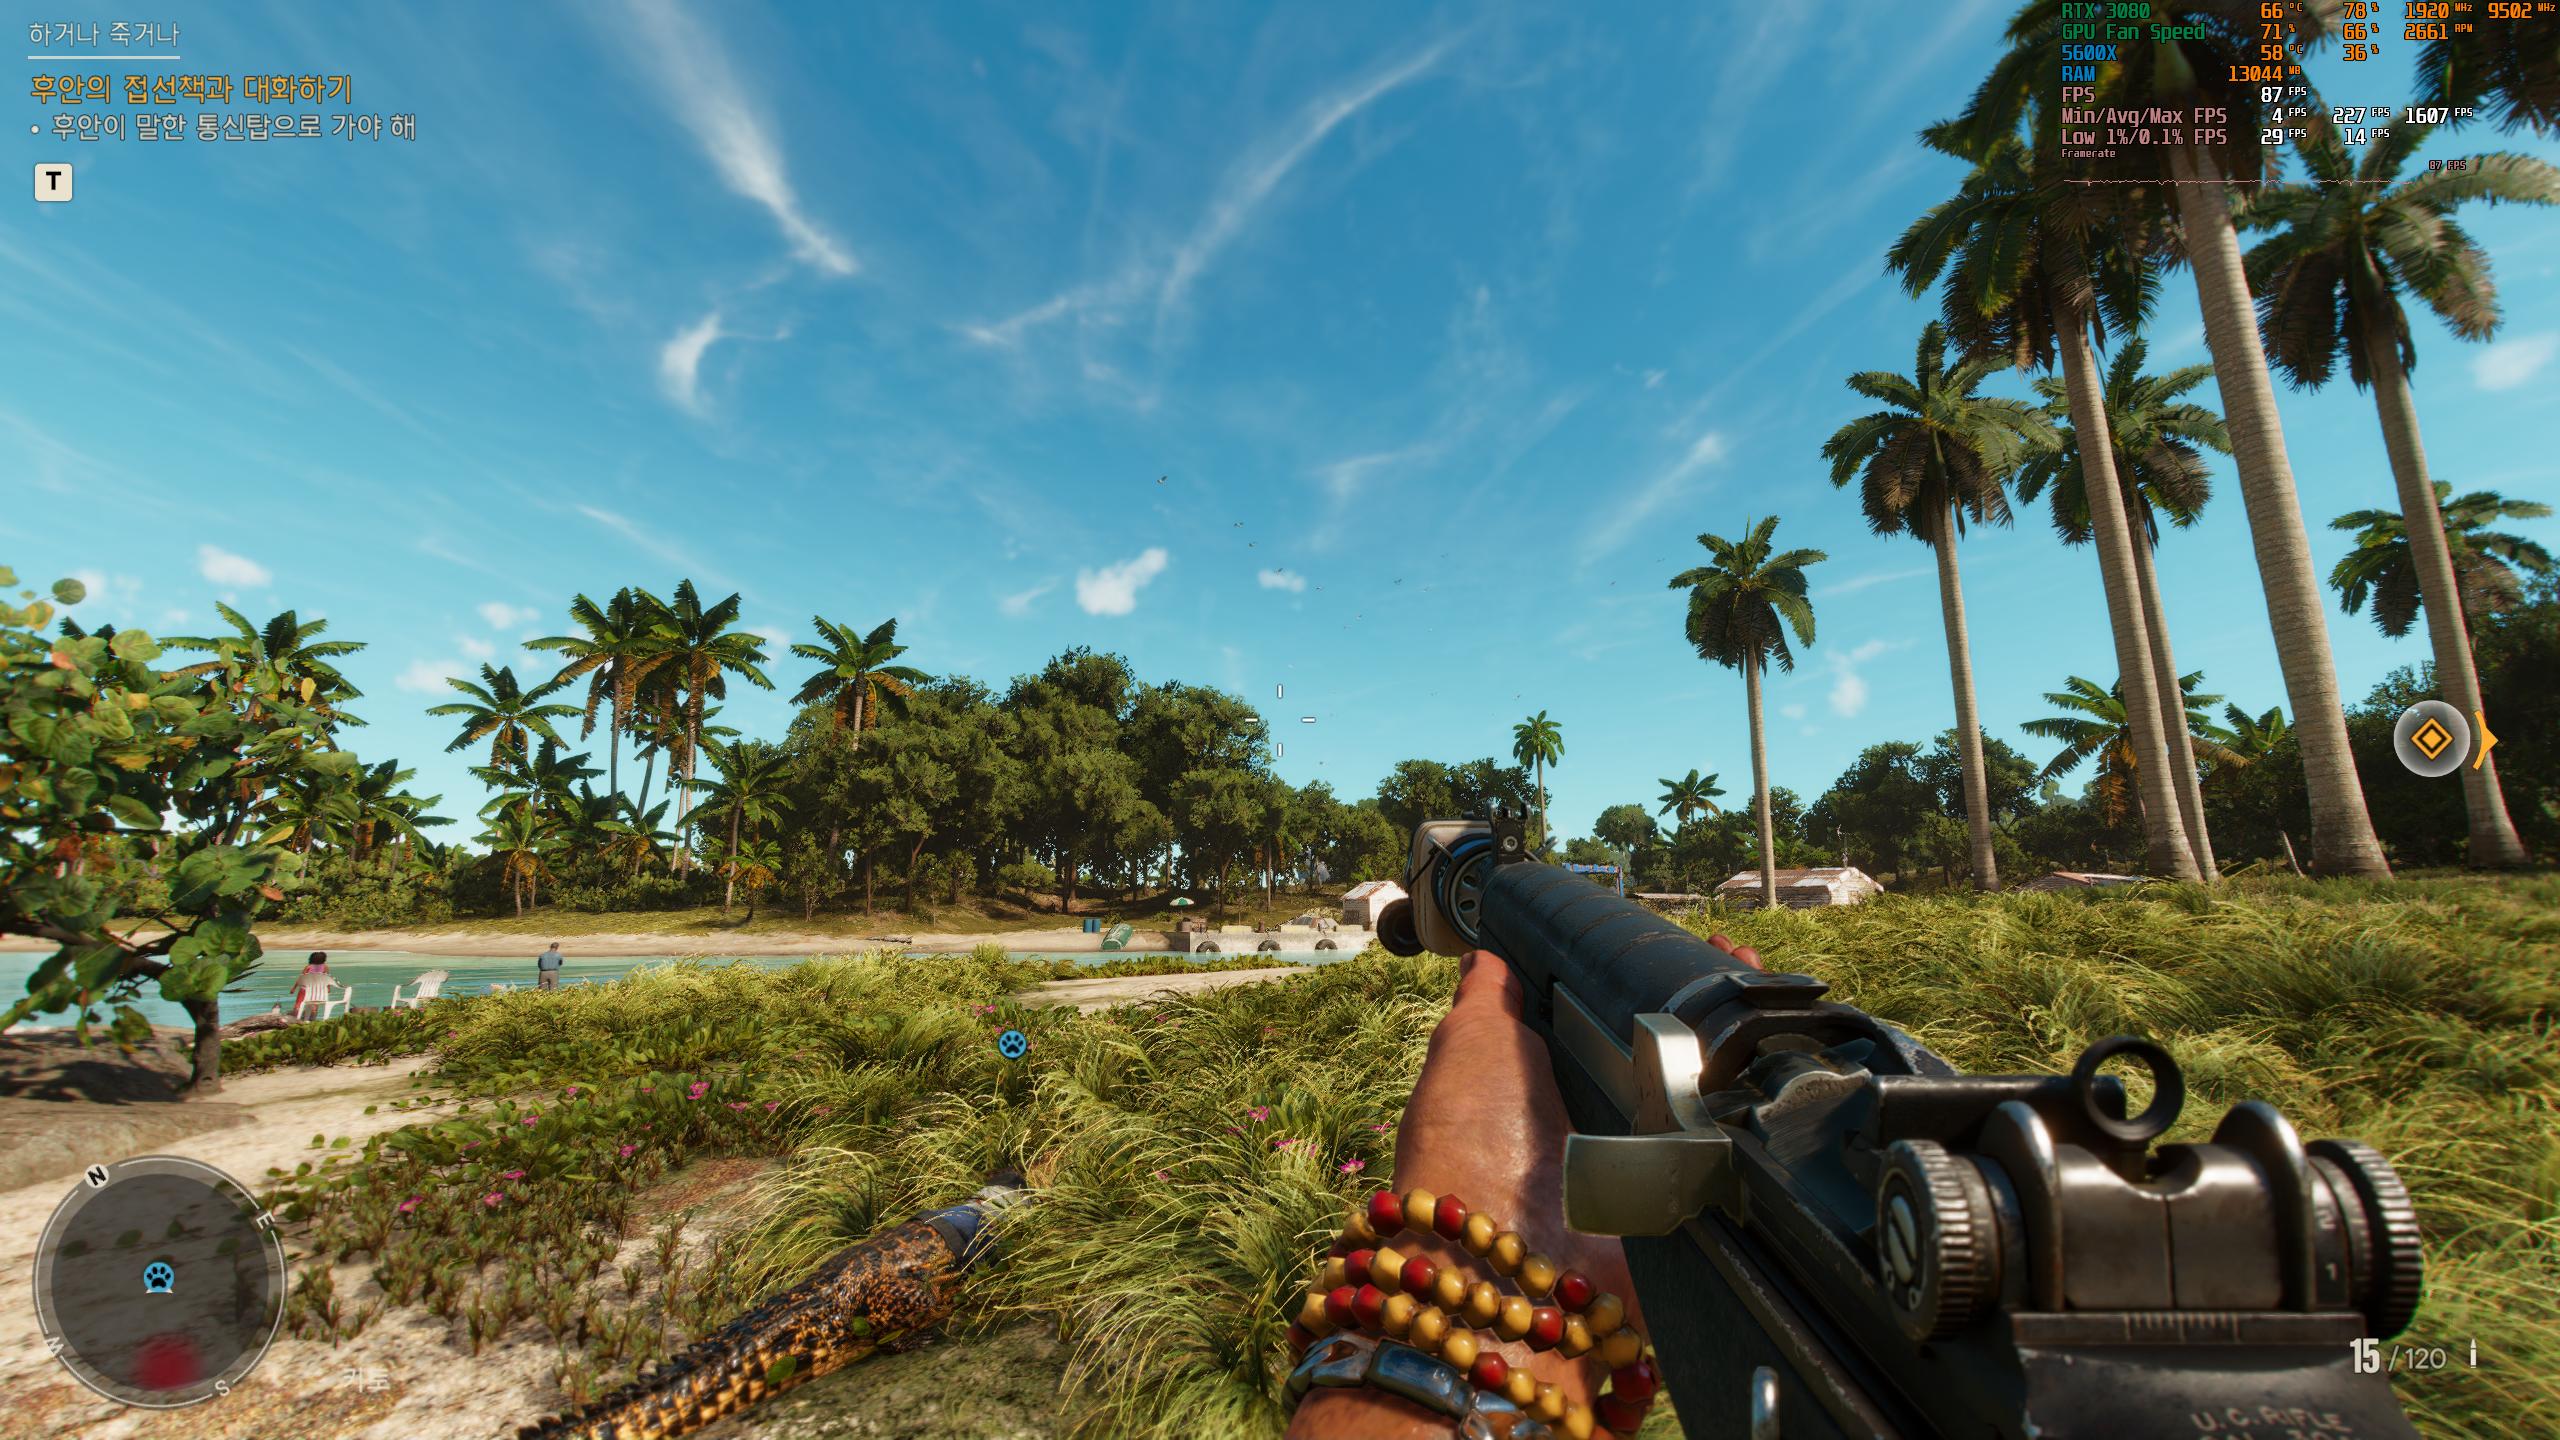 Far Cry 6 Screenshot 2021.10.11 - 01.21.05.54.png